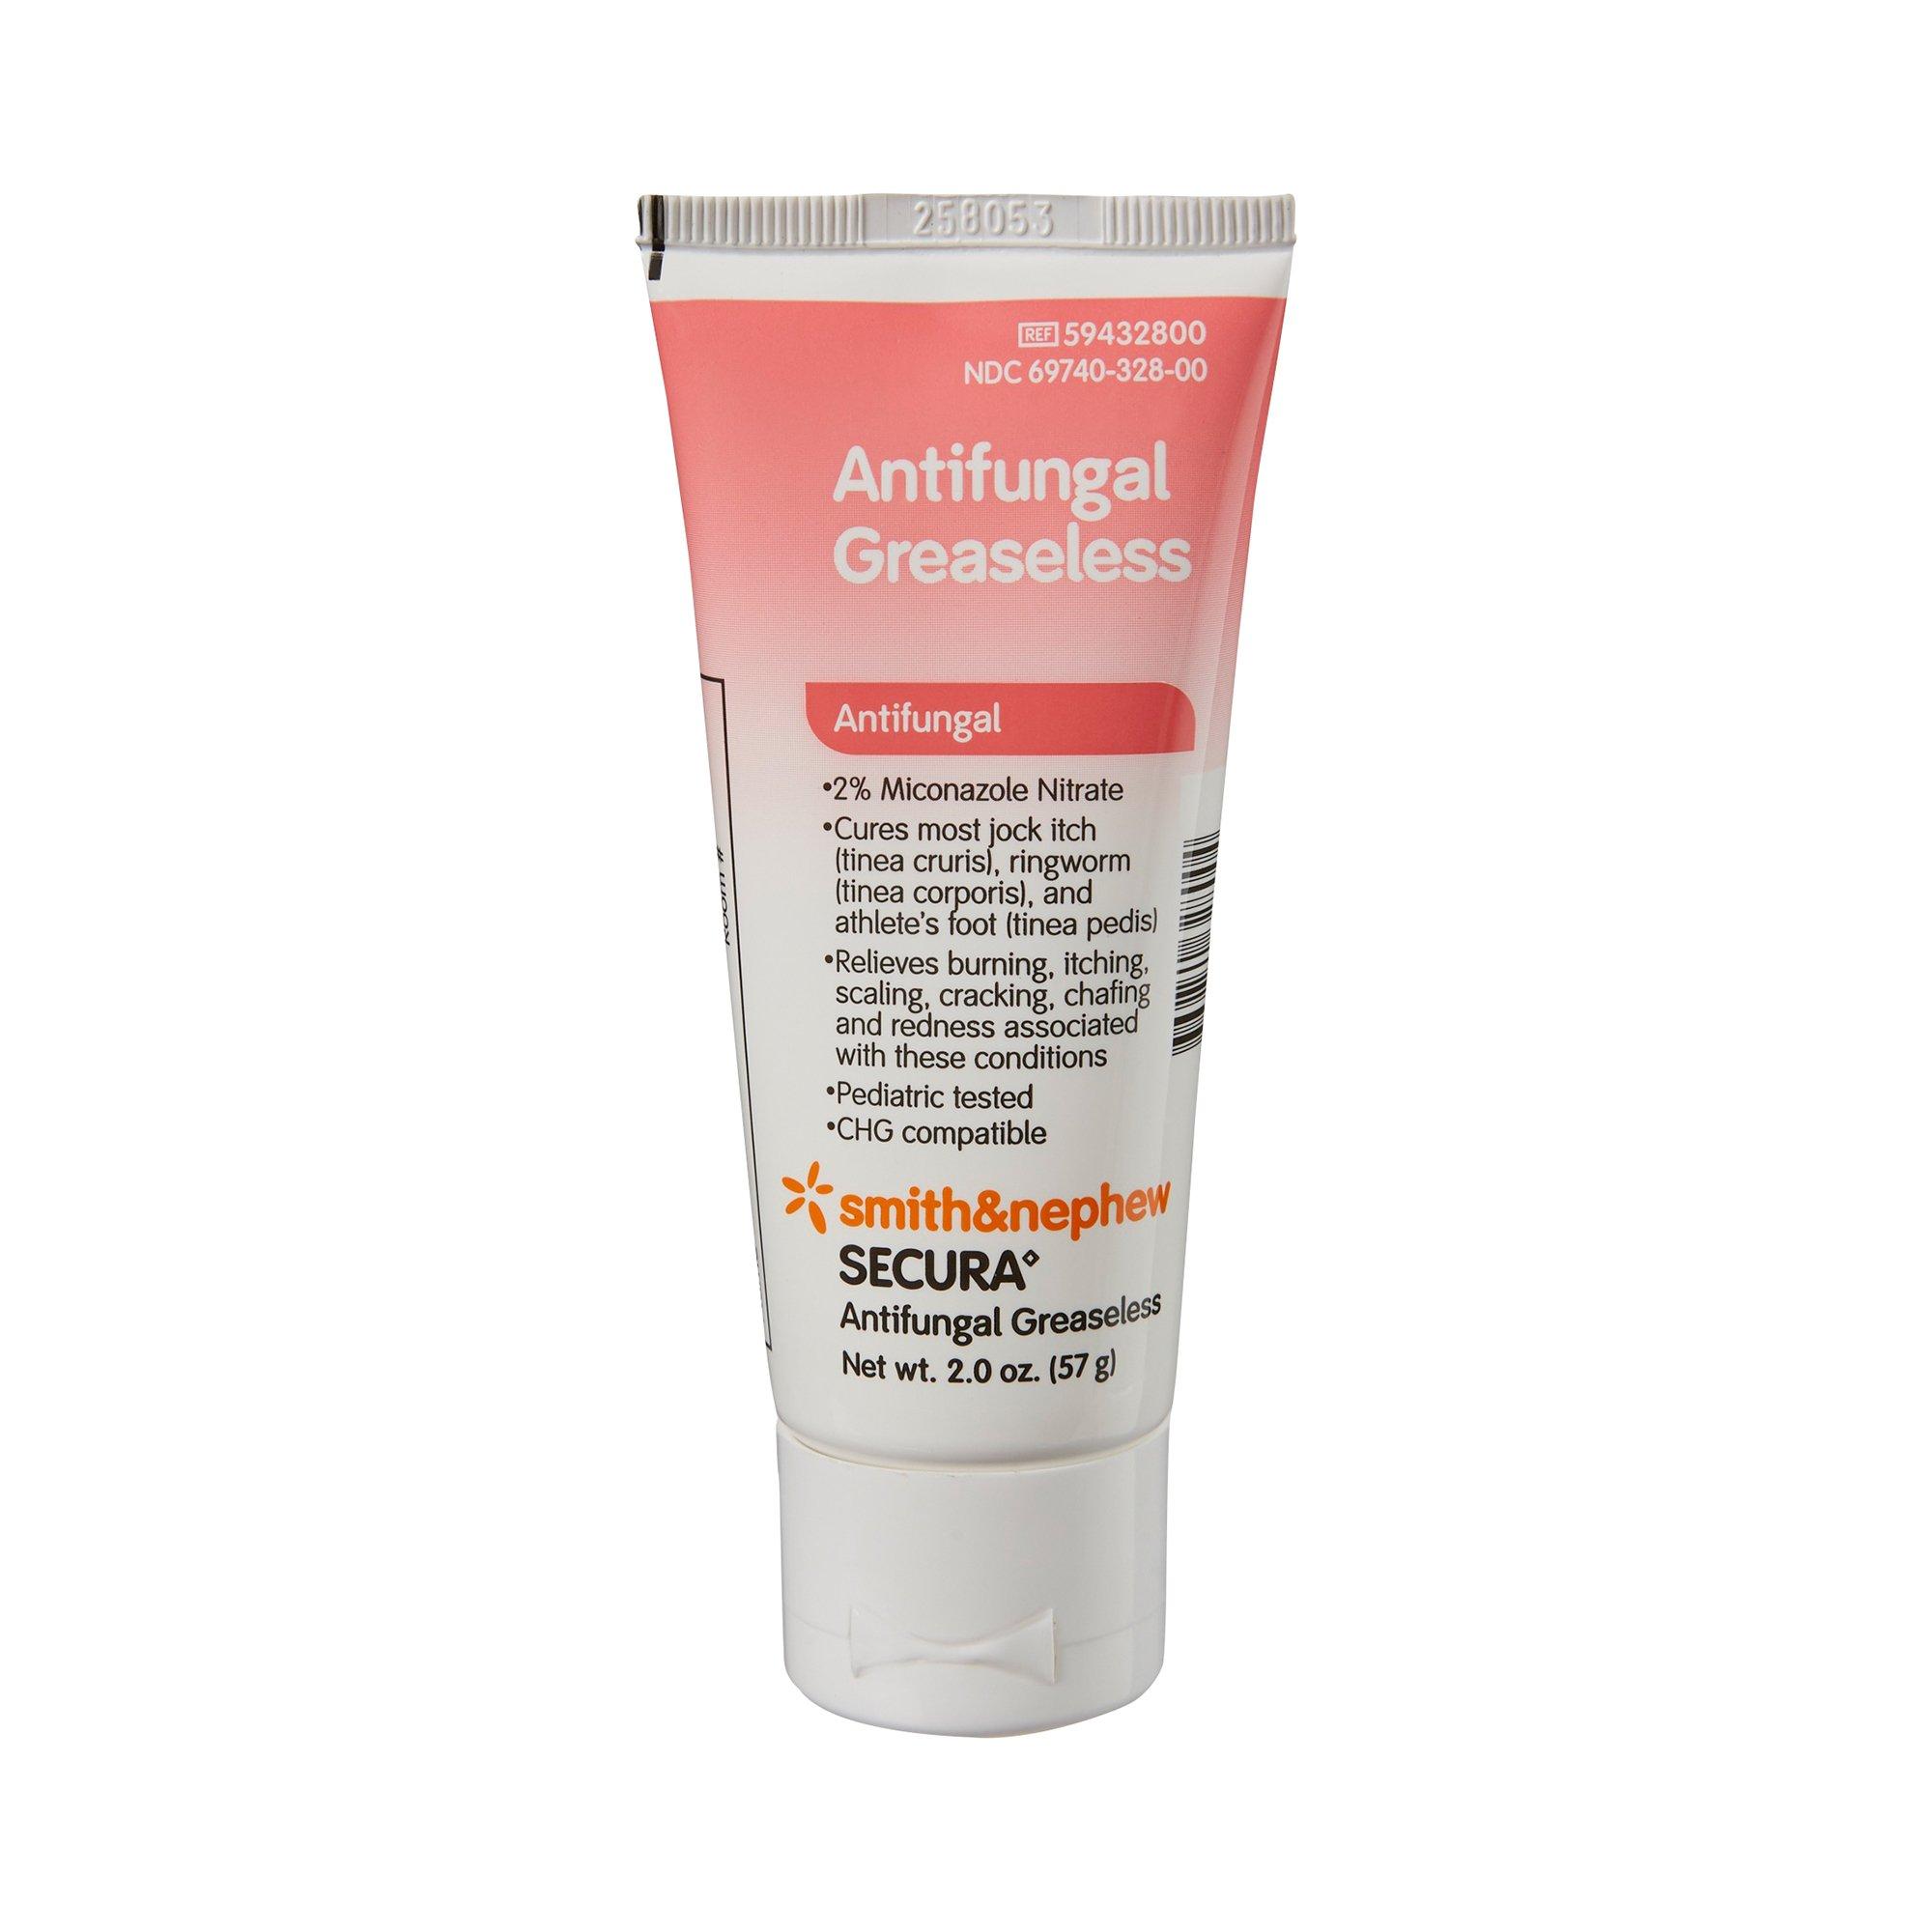 Secura Antifungal Greaseless Cream, 59432800, 2 oz. - 1 Each